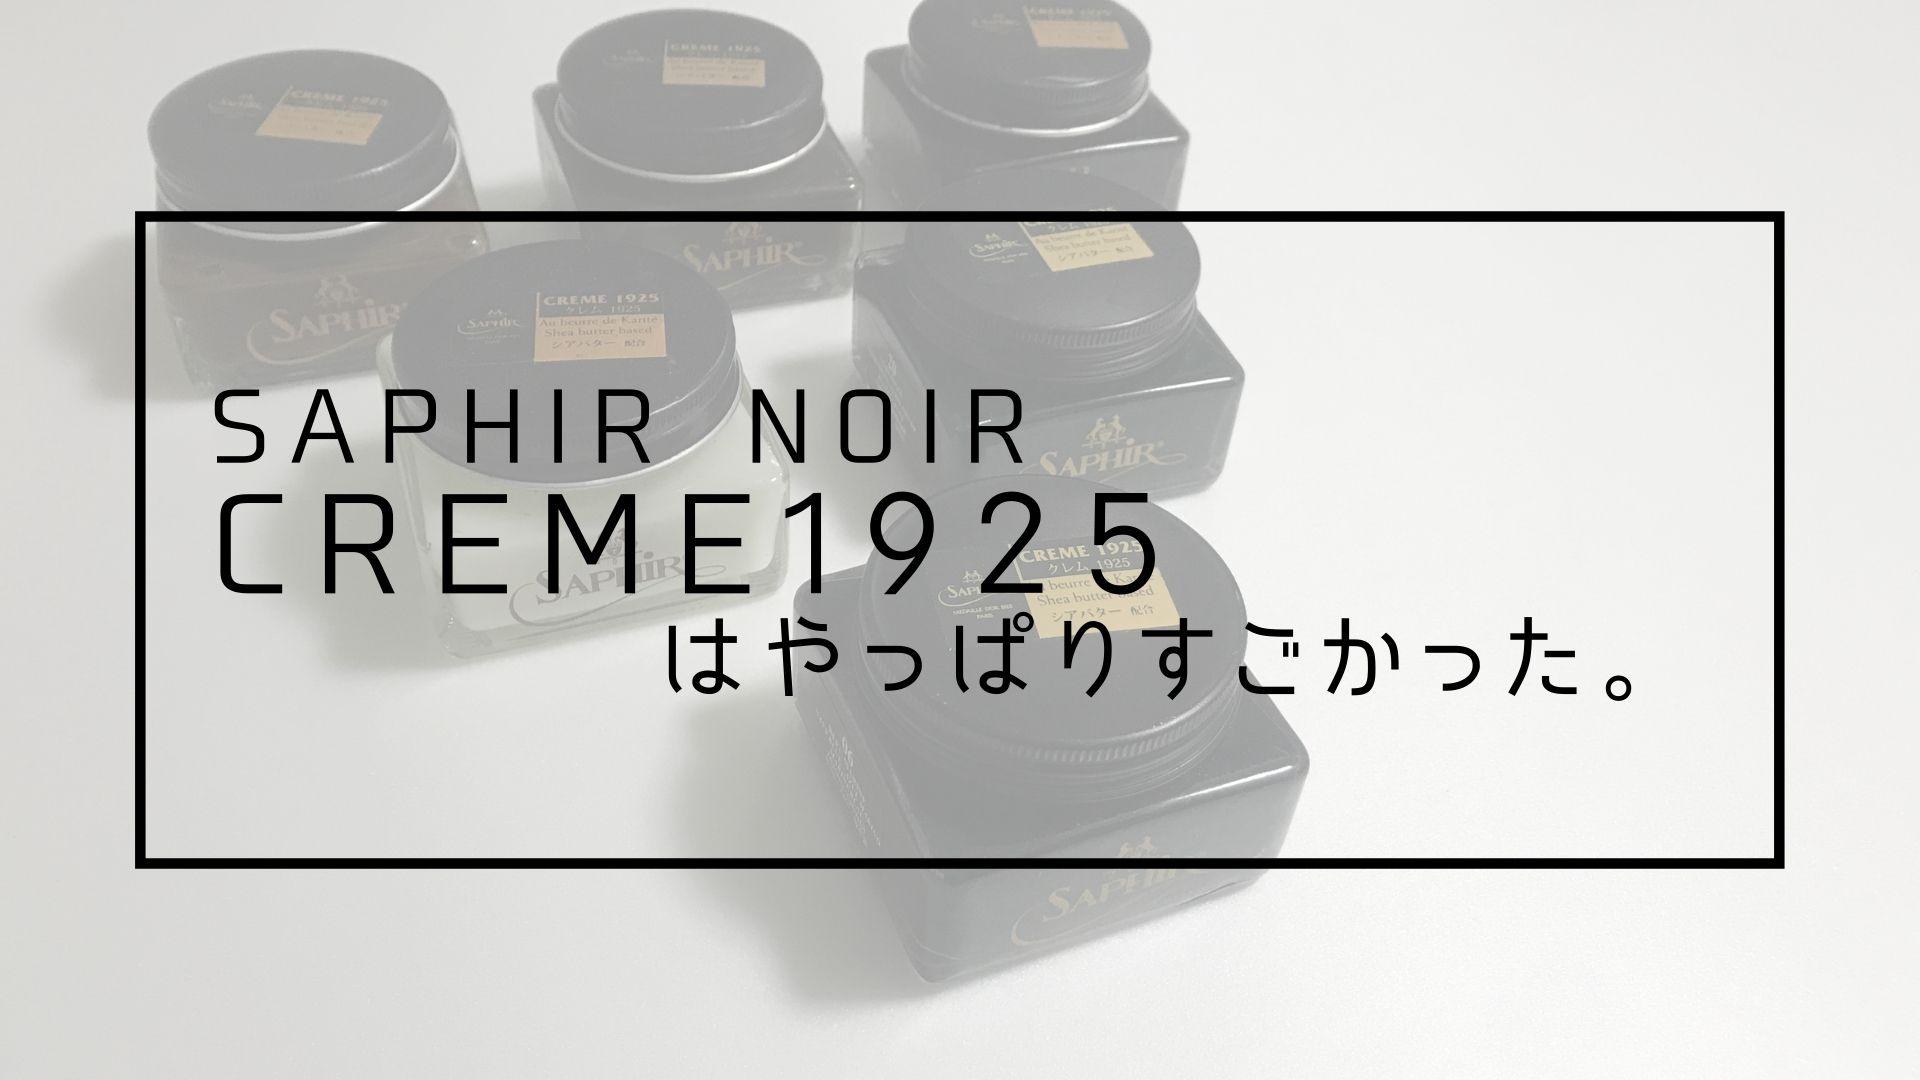 Saphir Noir Creme1925 はやっぱりすごかった。 | Lab.